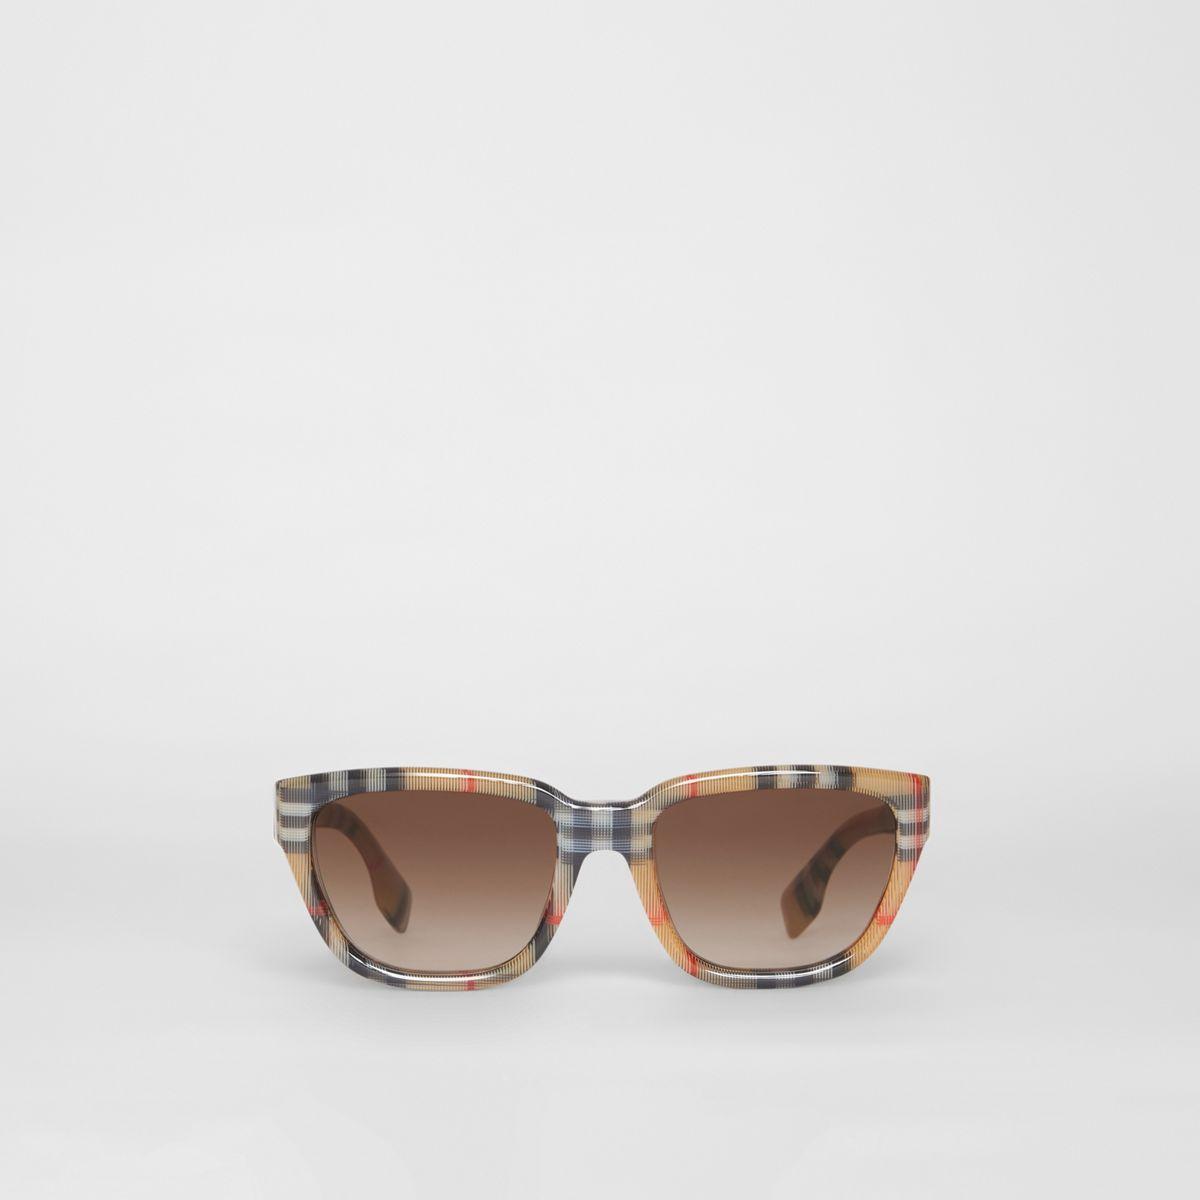 fabc822b925 Burberry. Women s Vintage Check Detail Square Frame Sunglasses